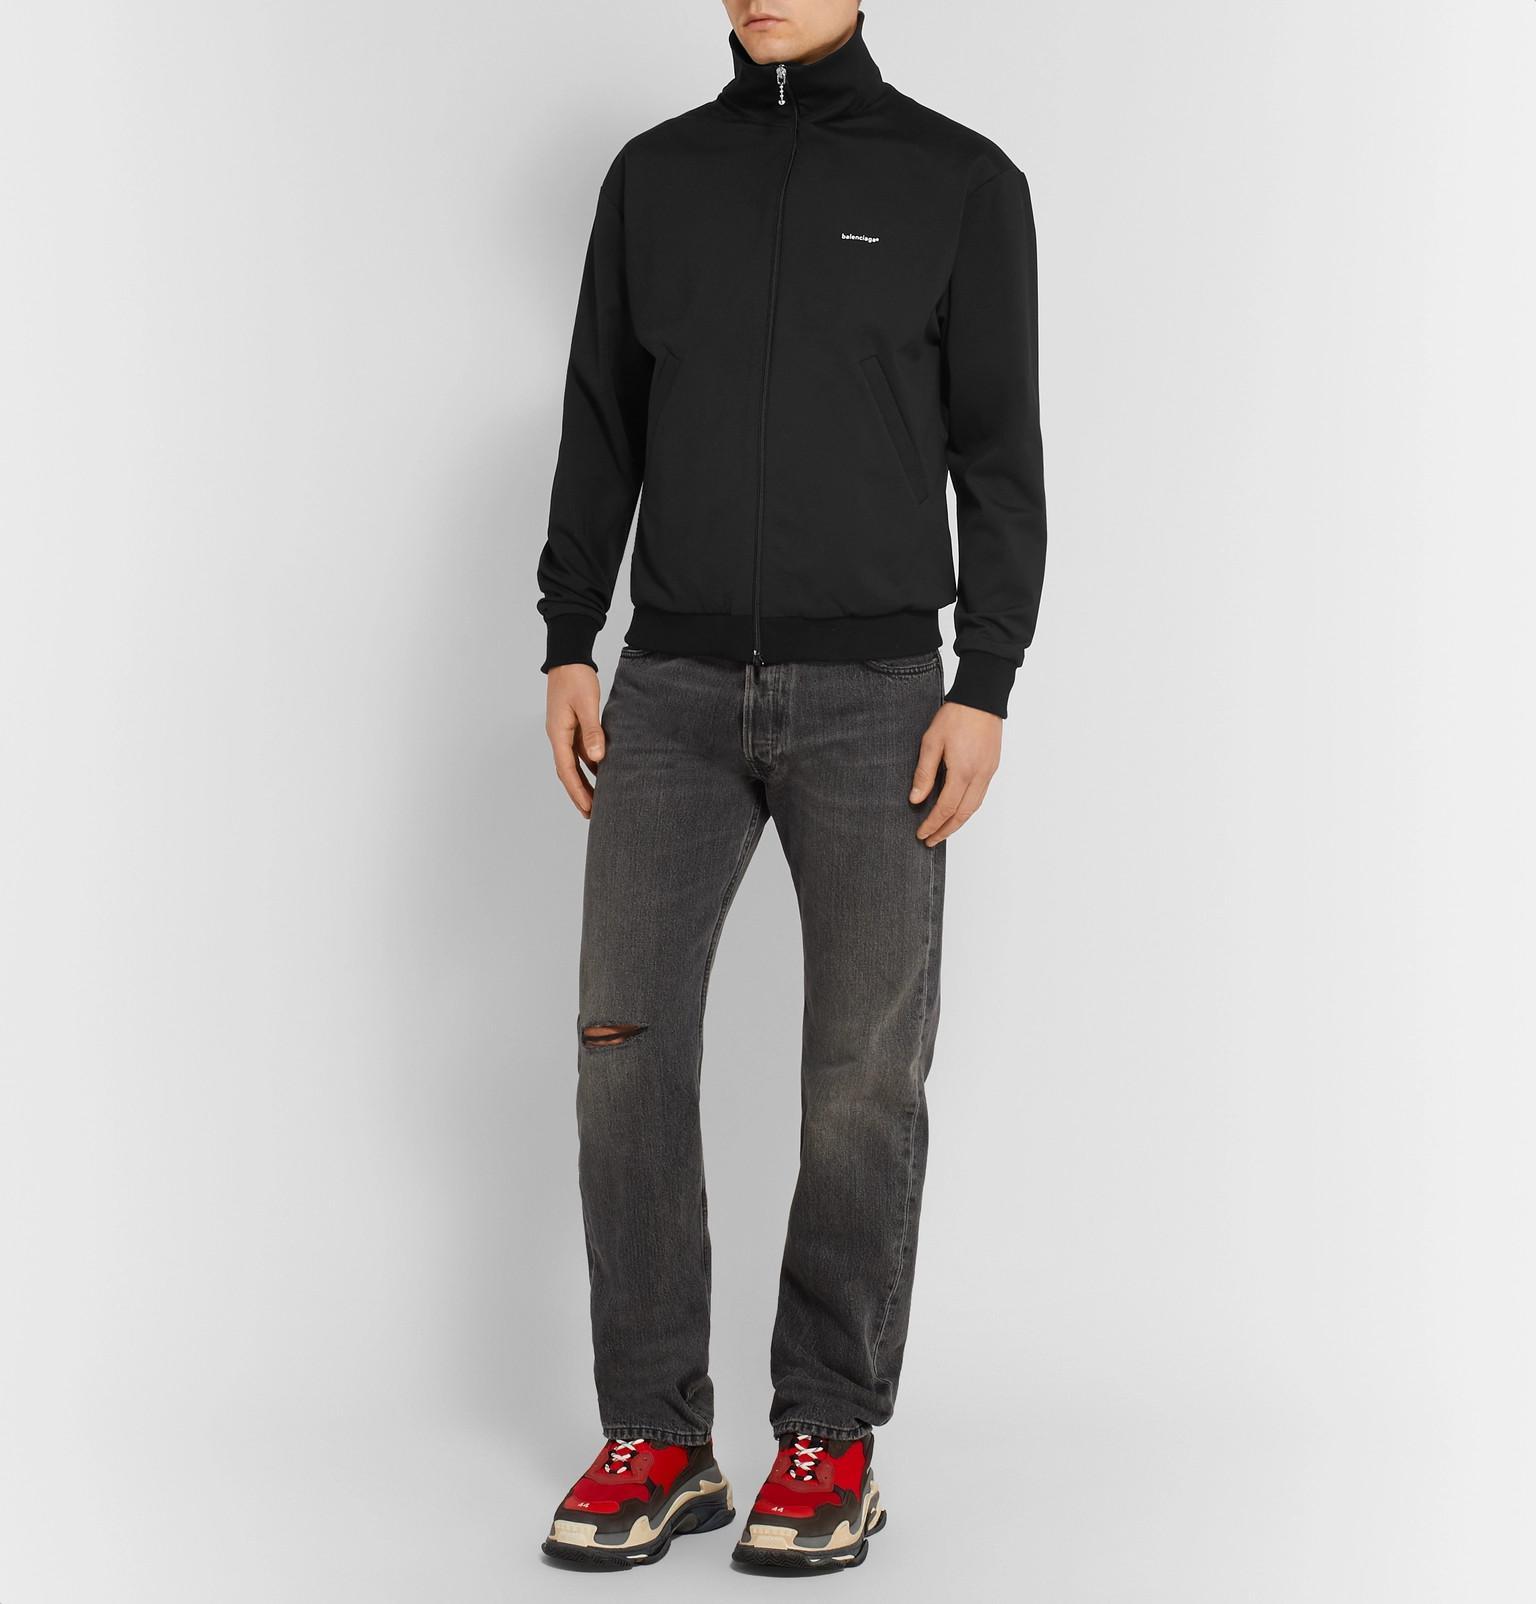 Black Track For In Balenciaga Jacket Lyst Slim Men Jersey Fit wAY4wxBqT